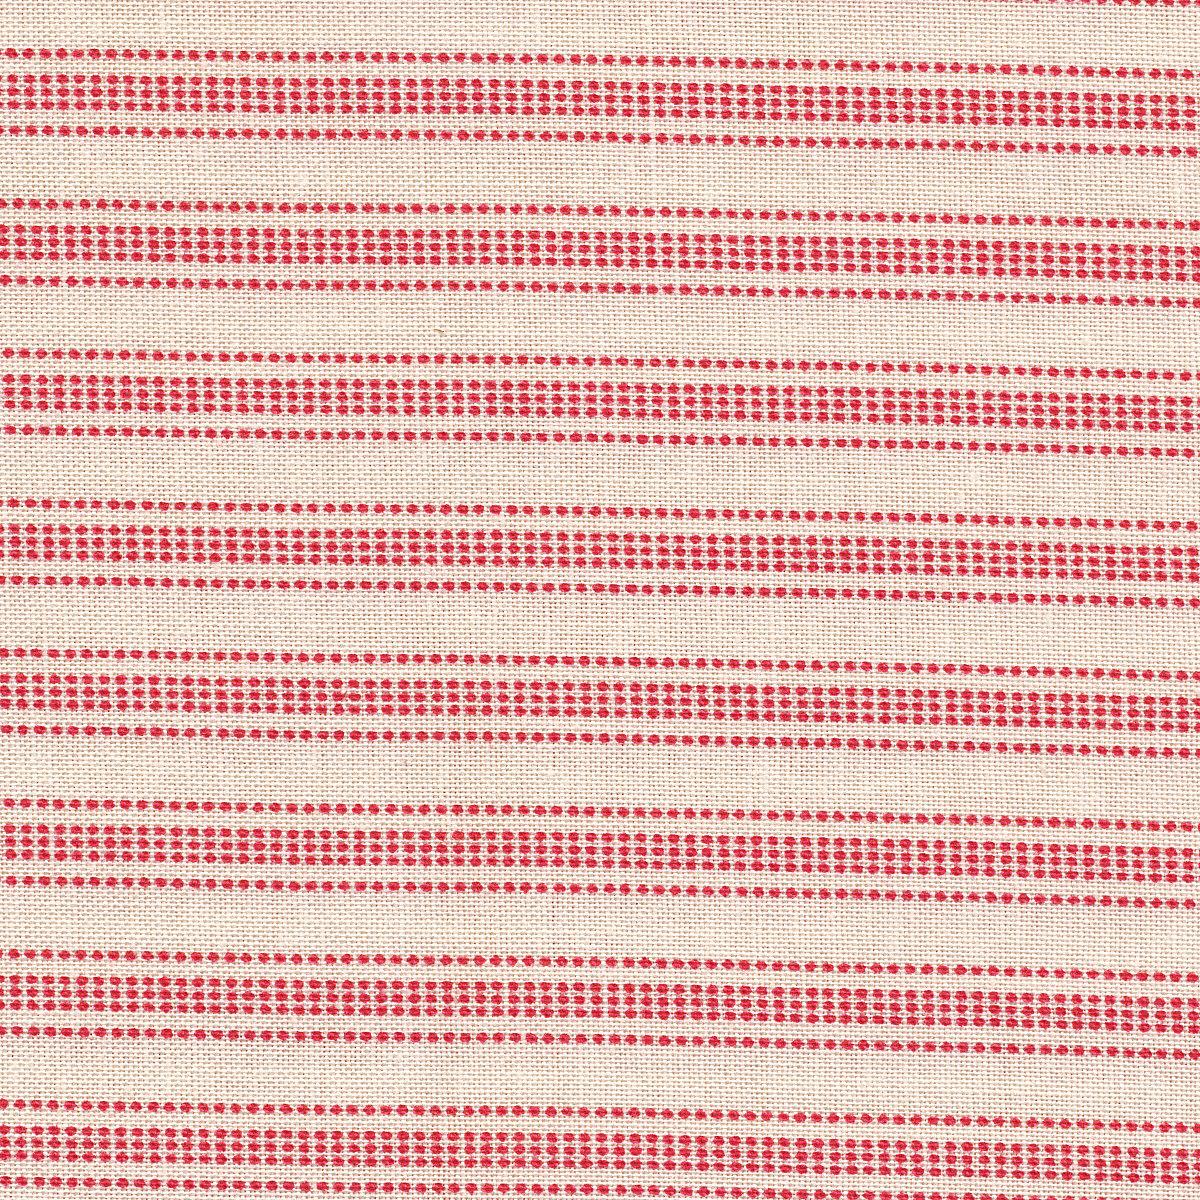 Tea Towel - Red Apple Cake - 130068